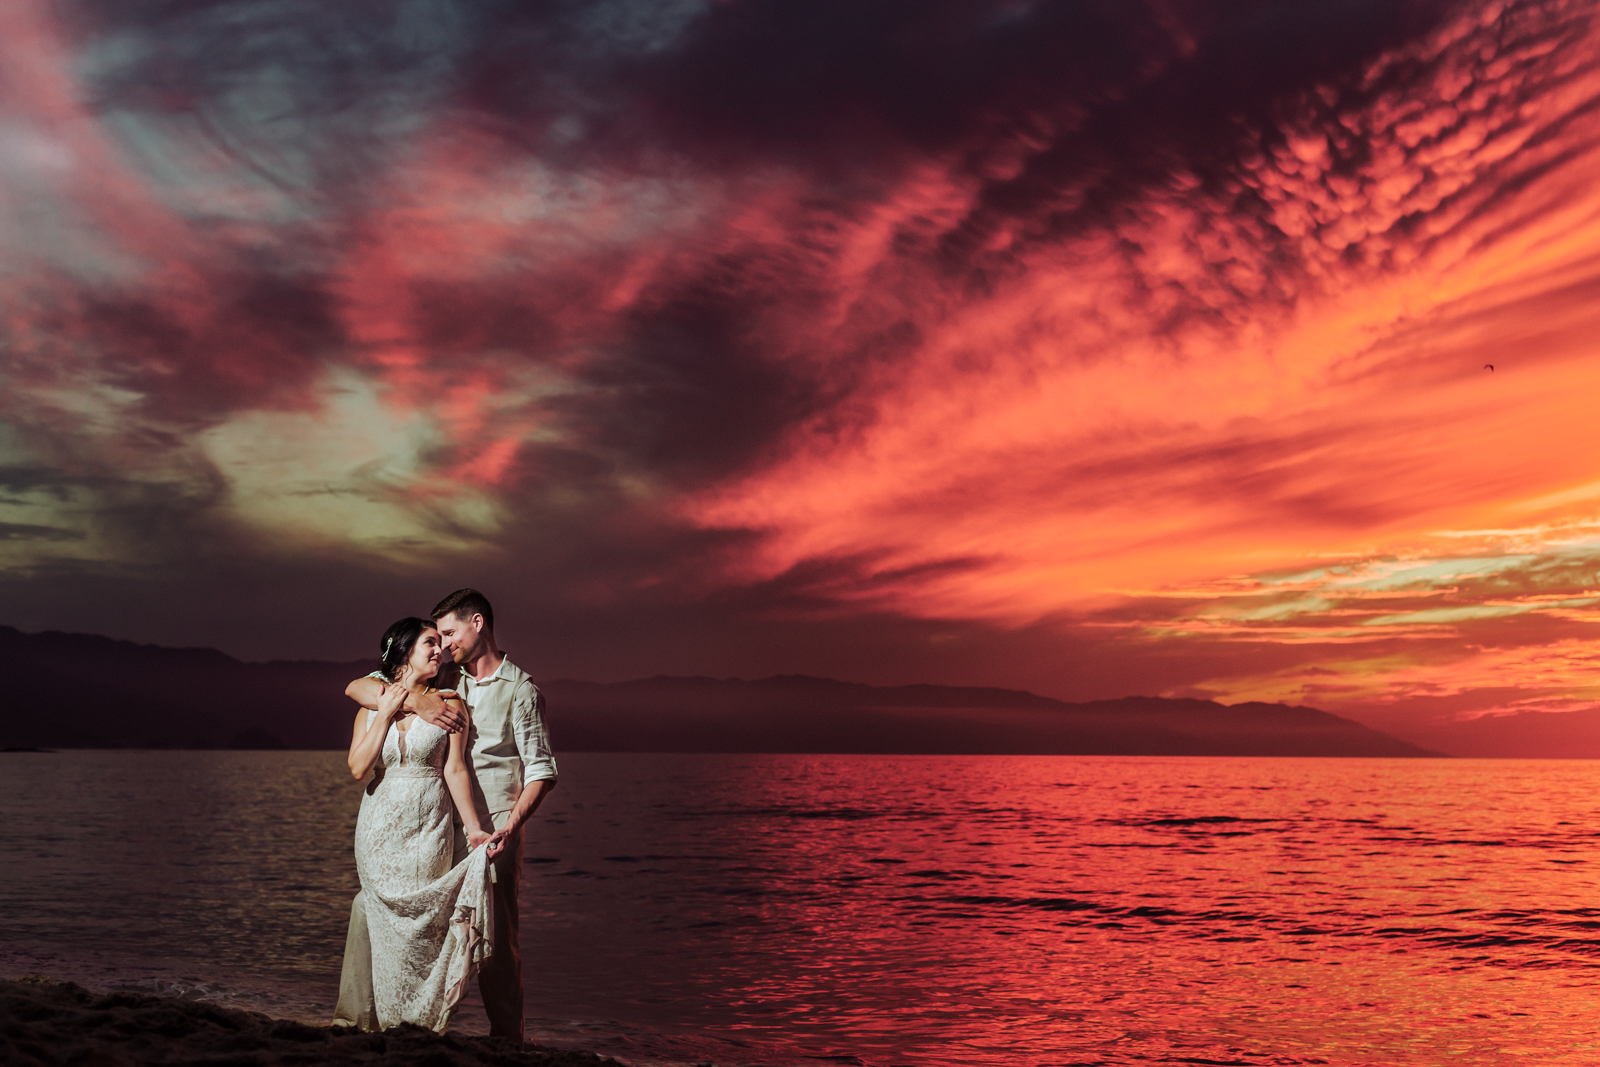 bride groom sunset red sky beach ocean wedding Vallarta mountain